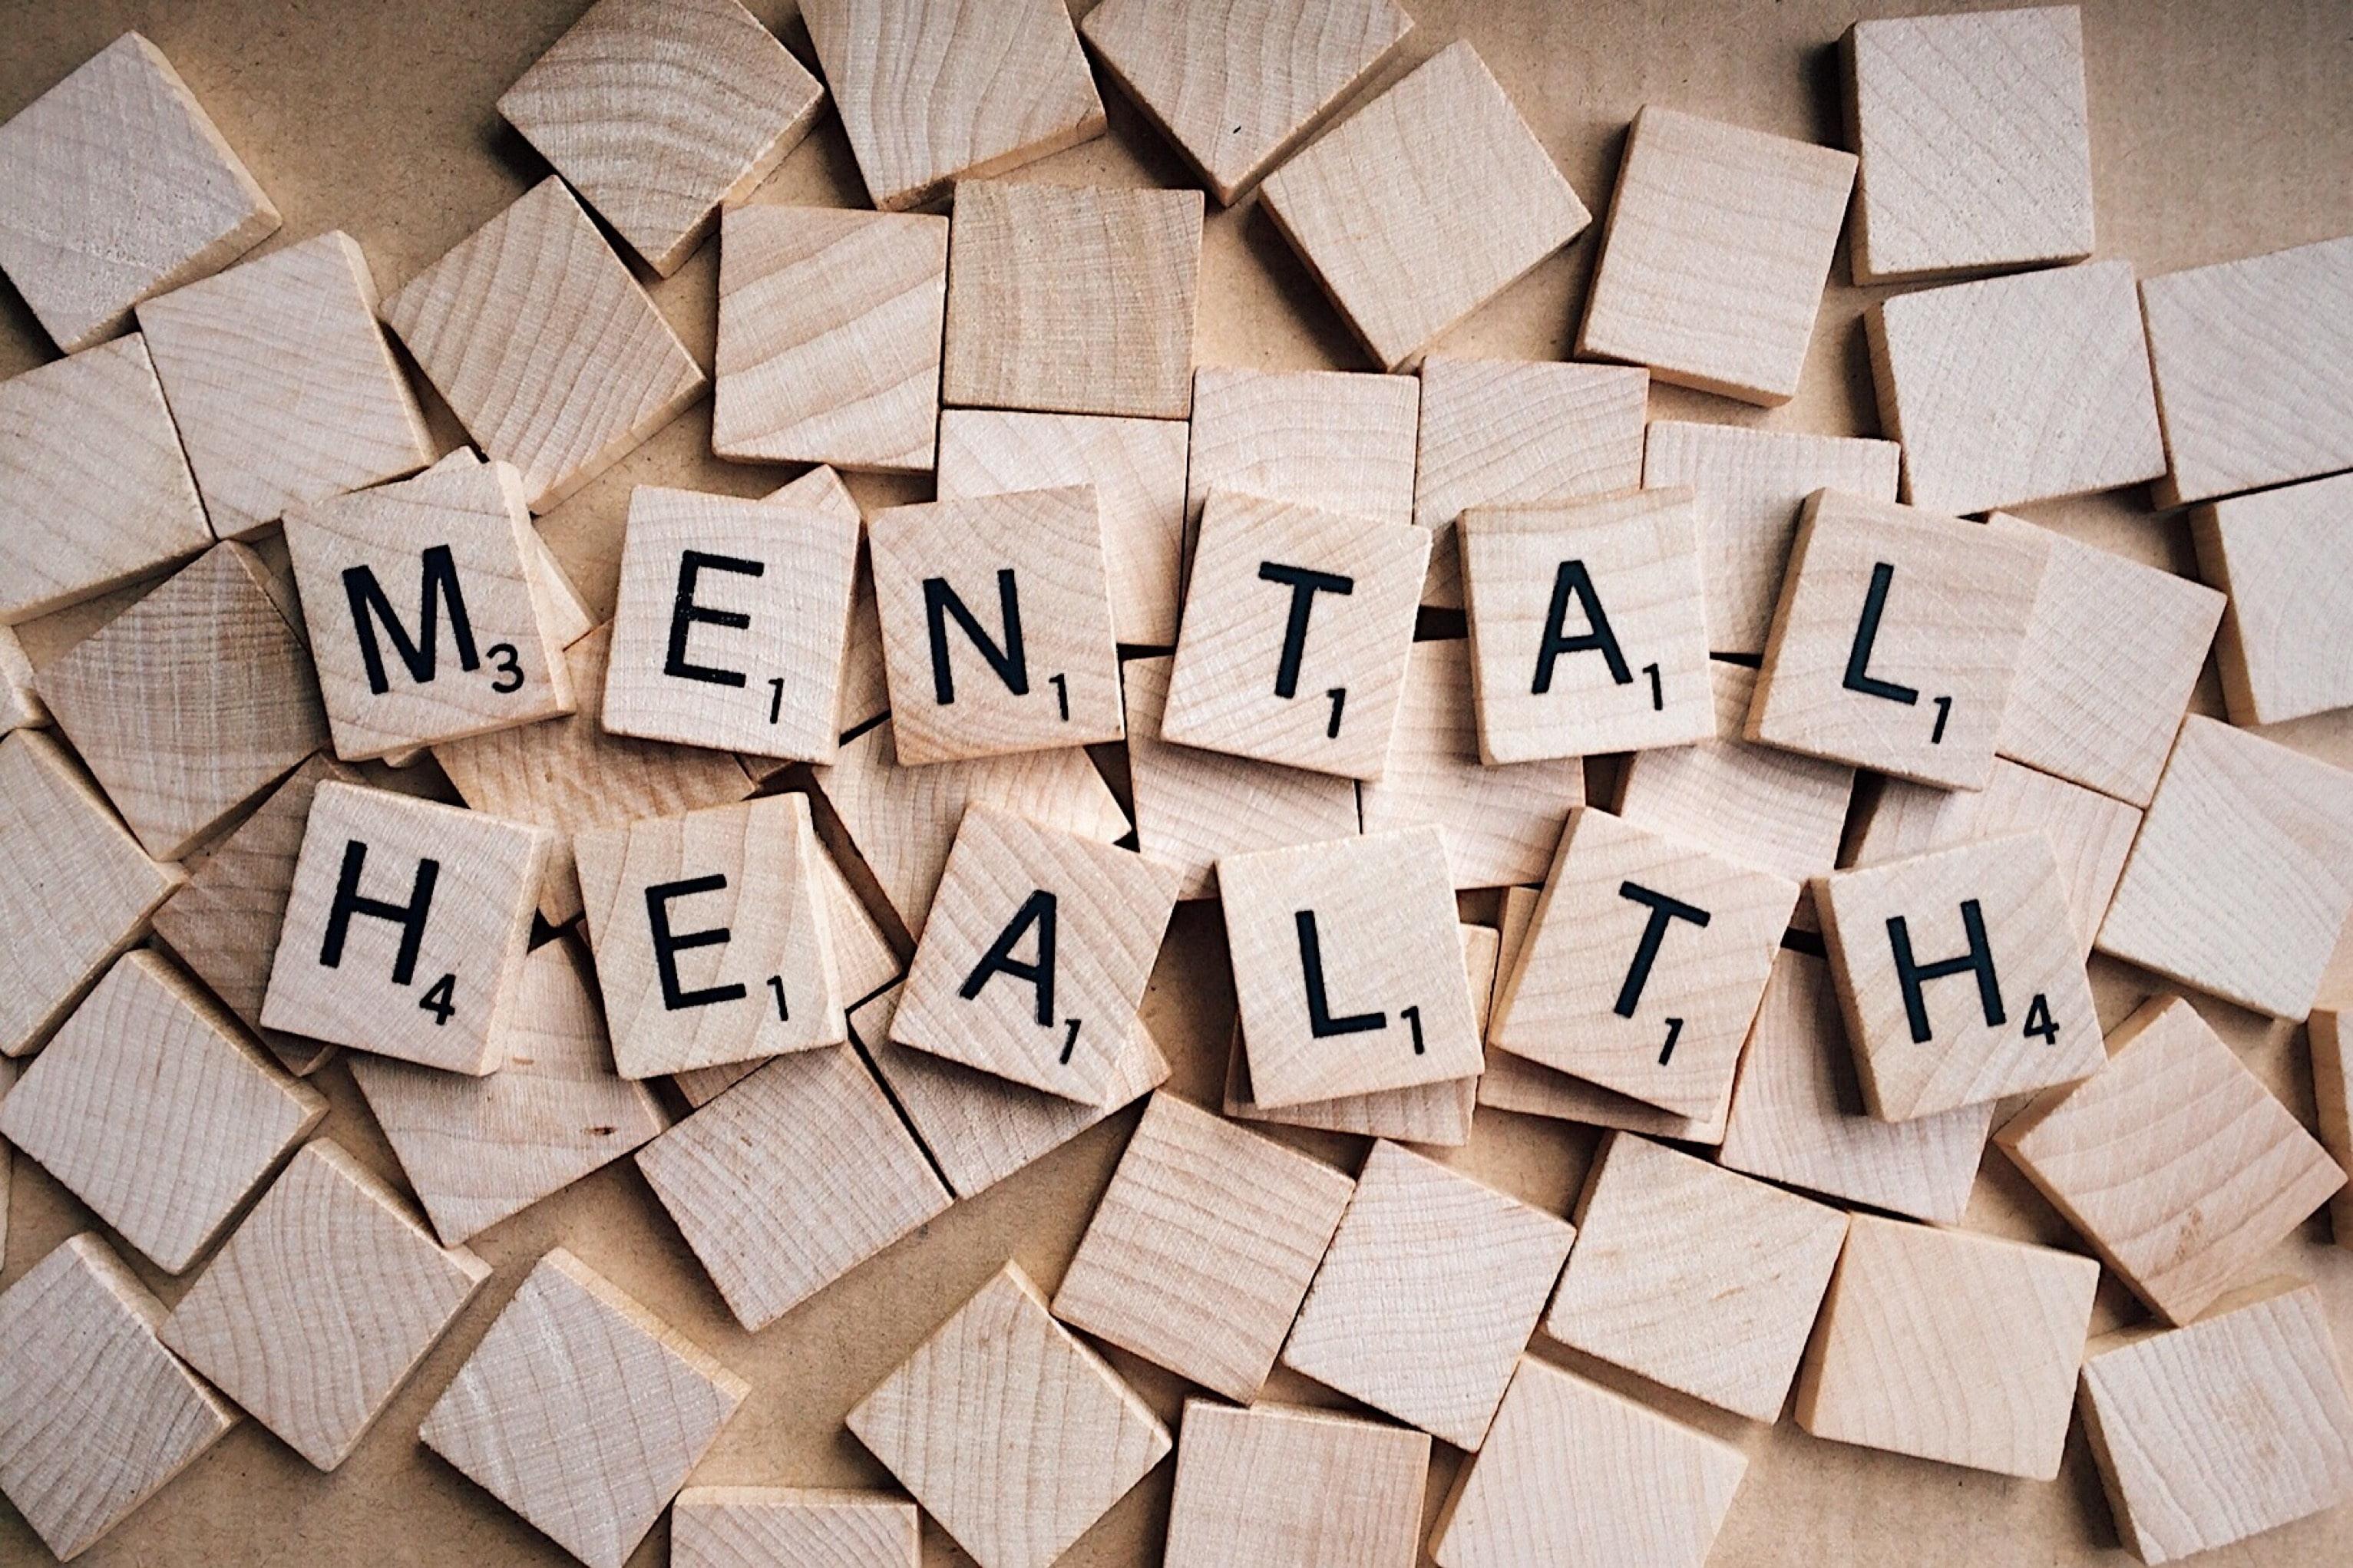 Scrabble tiles spelling mental health text above scrabble tiles 3065x2043